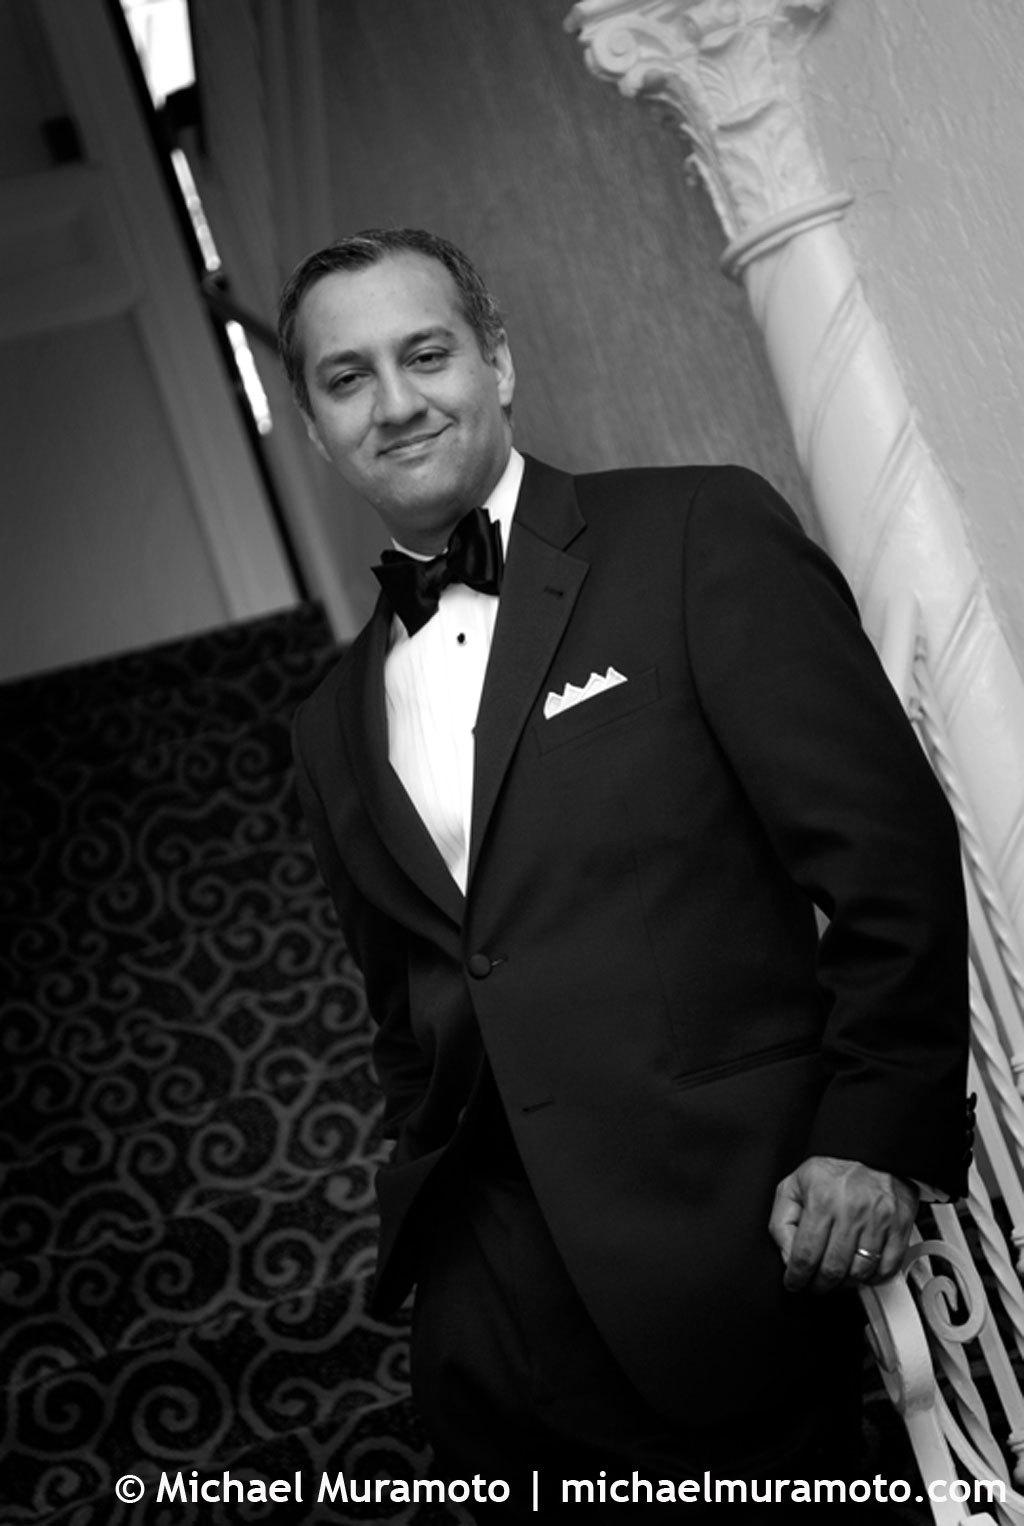 Groom, Hotel, Black and white, Lobby, Bw, Sausalito, Michael muramoto photography